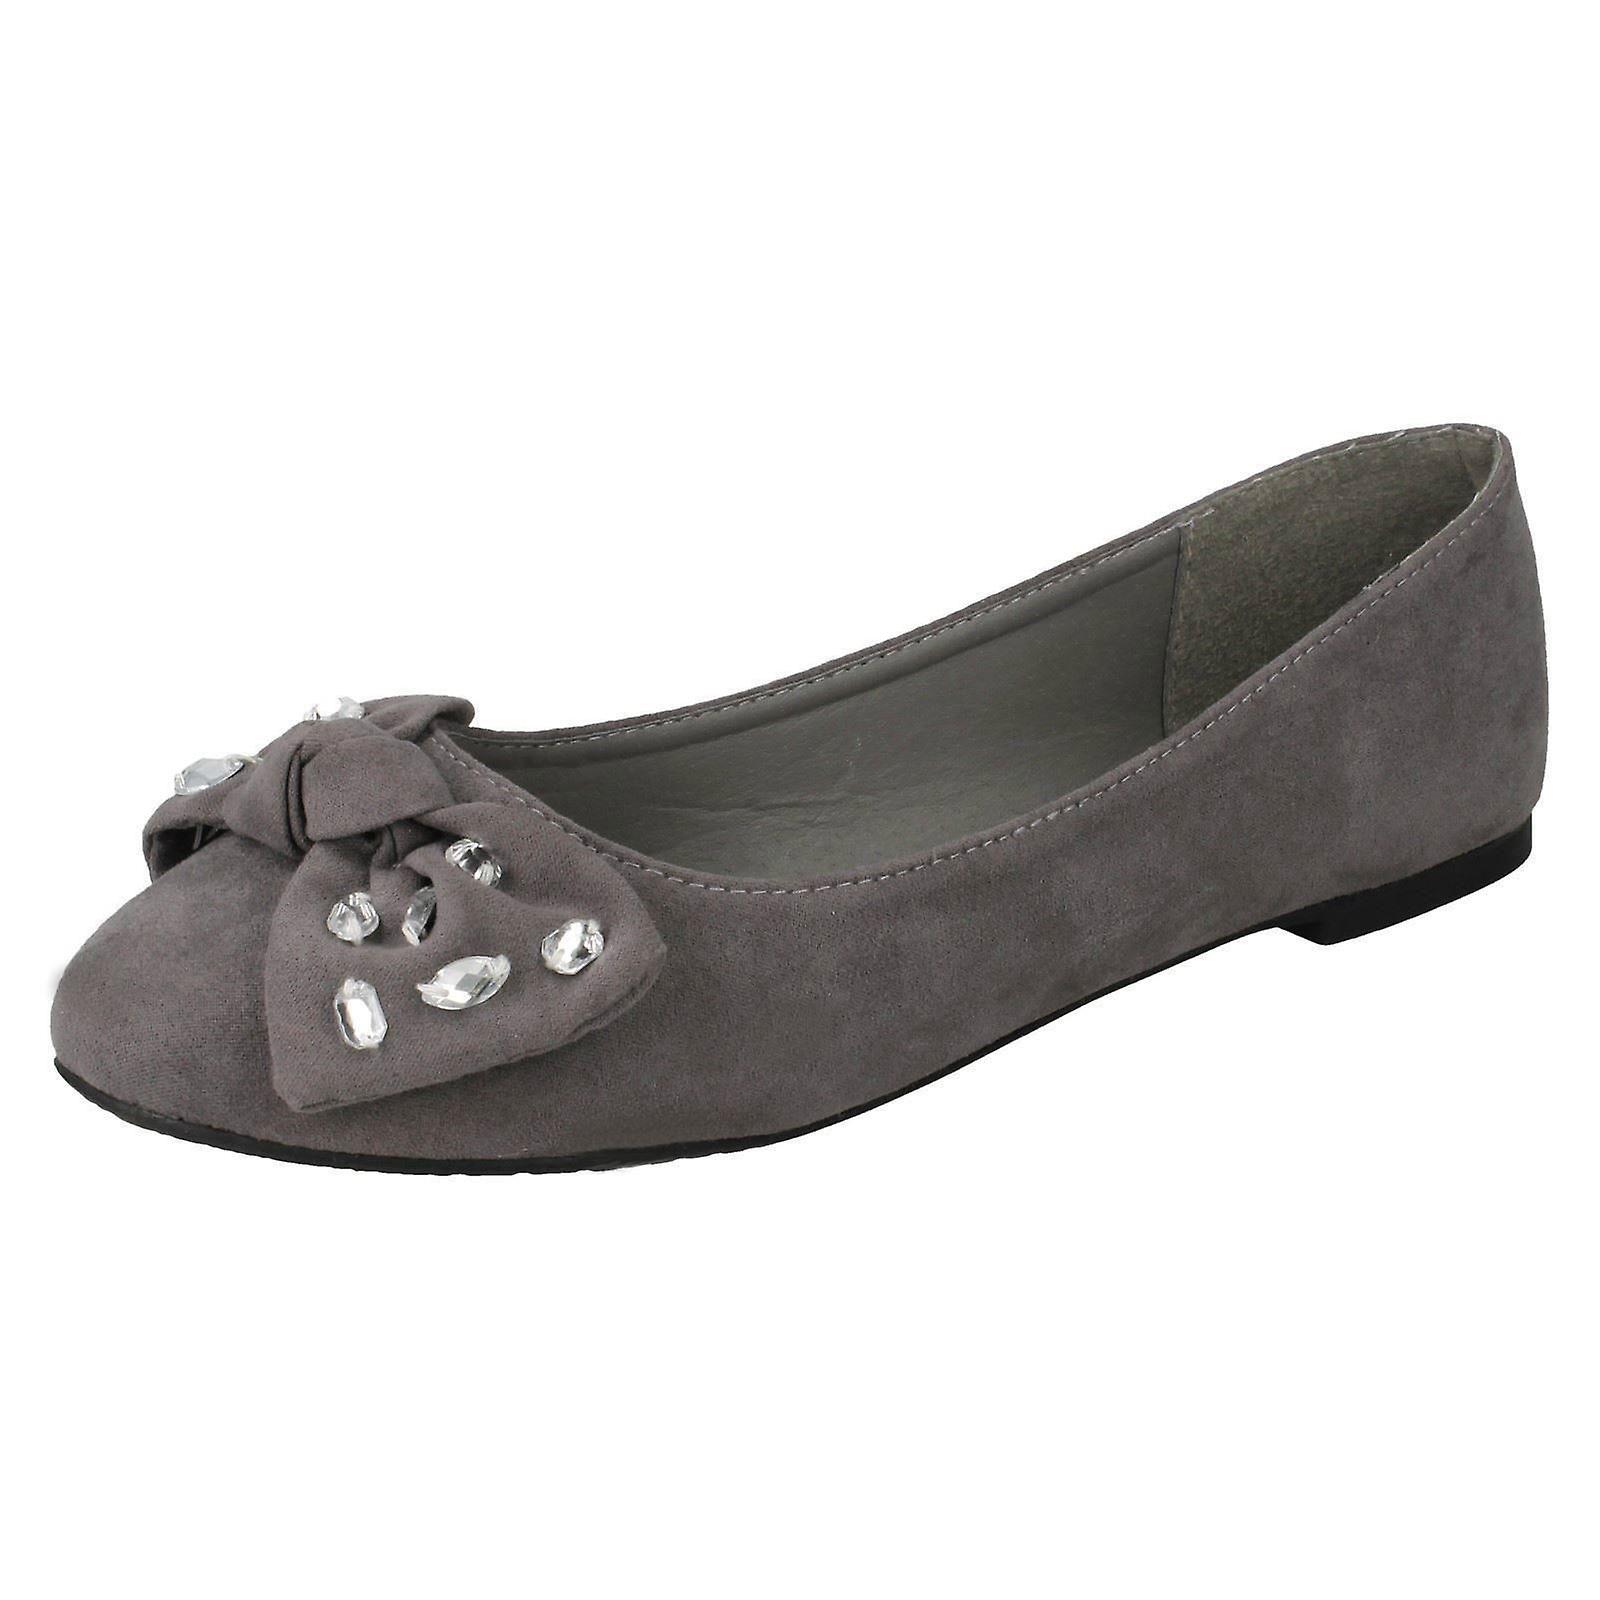 Ballerina Ladies Shoes Spot Bow Jewel On F80386 Zvw4qvf